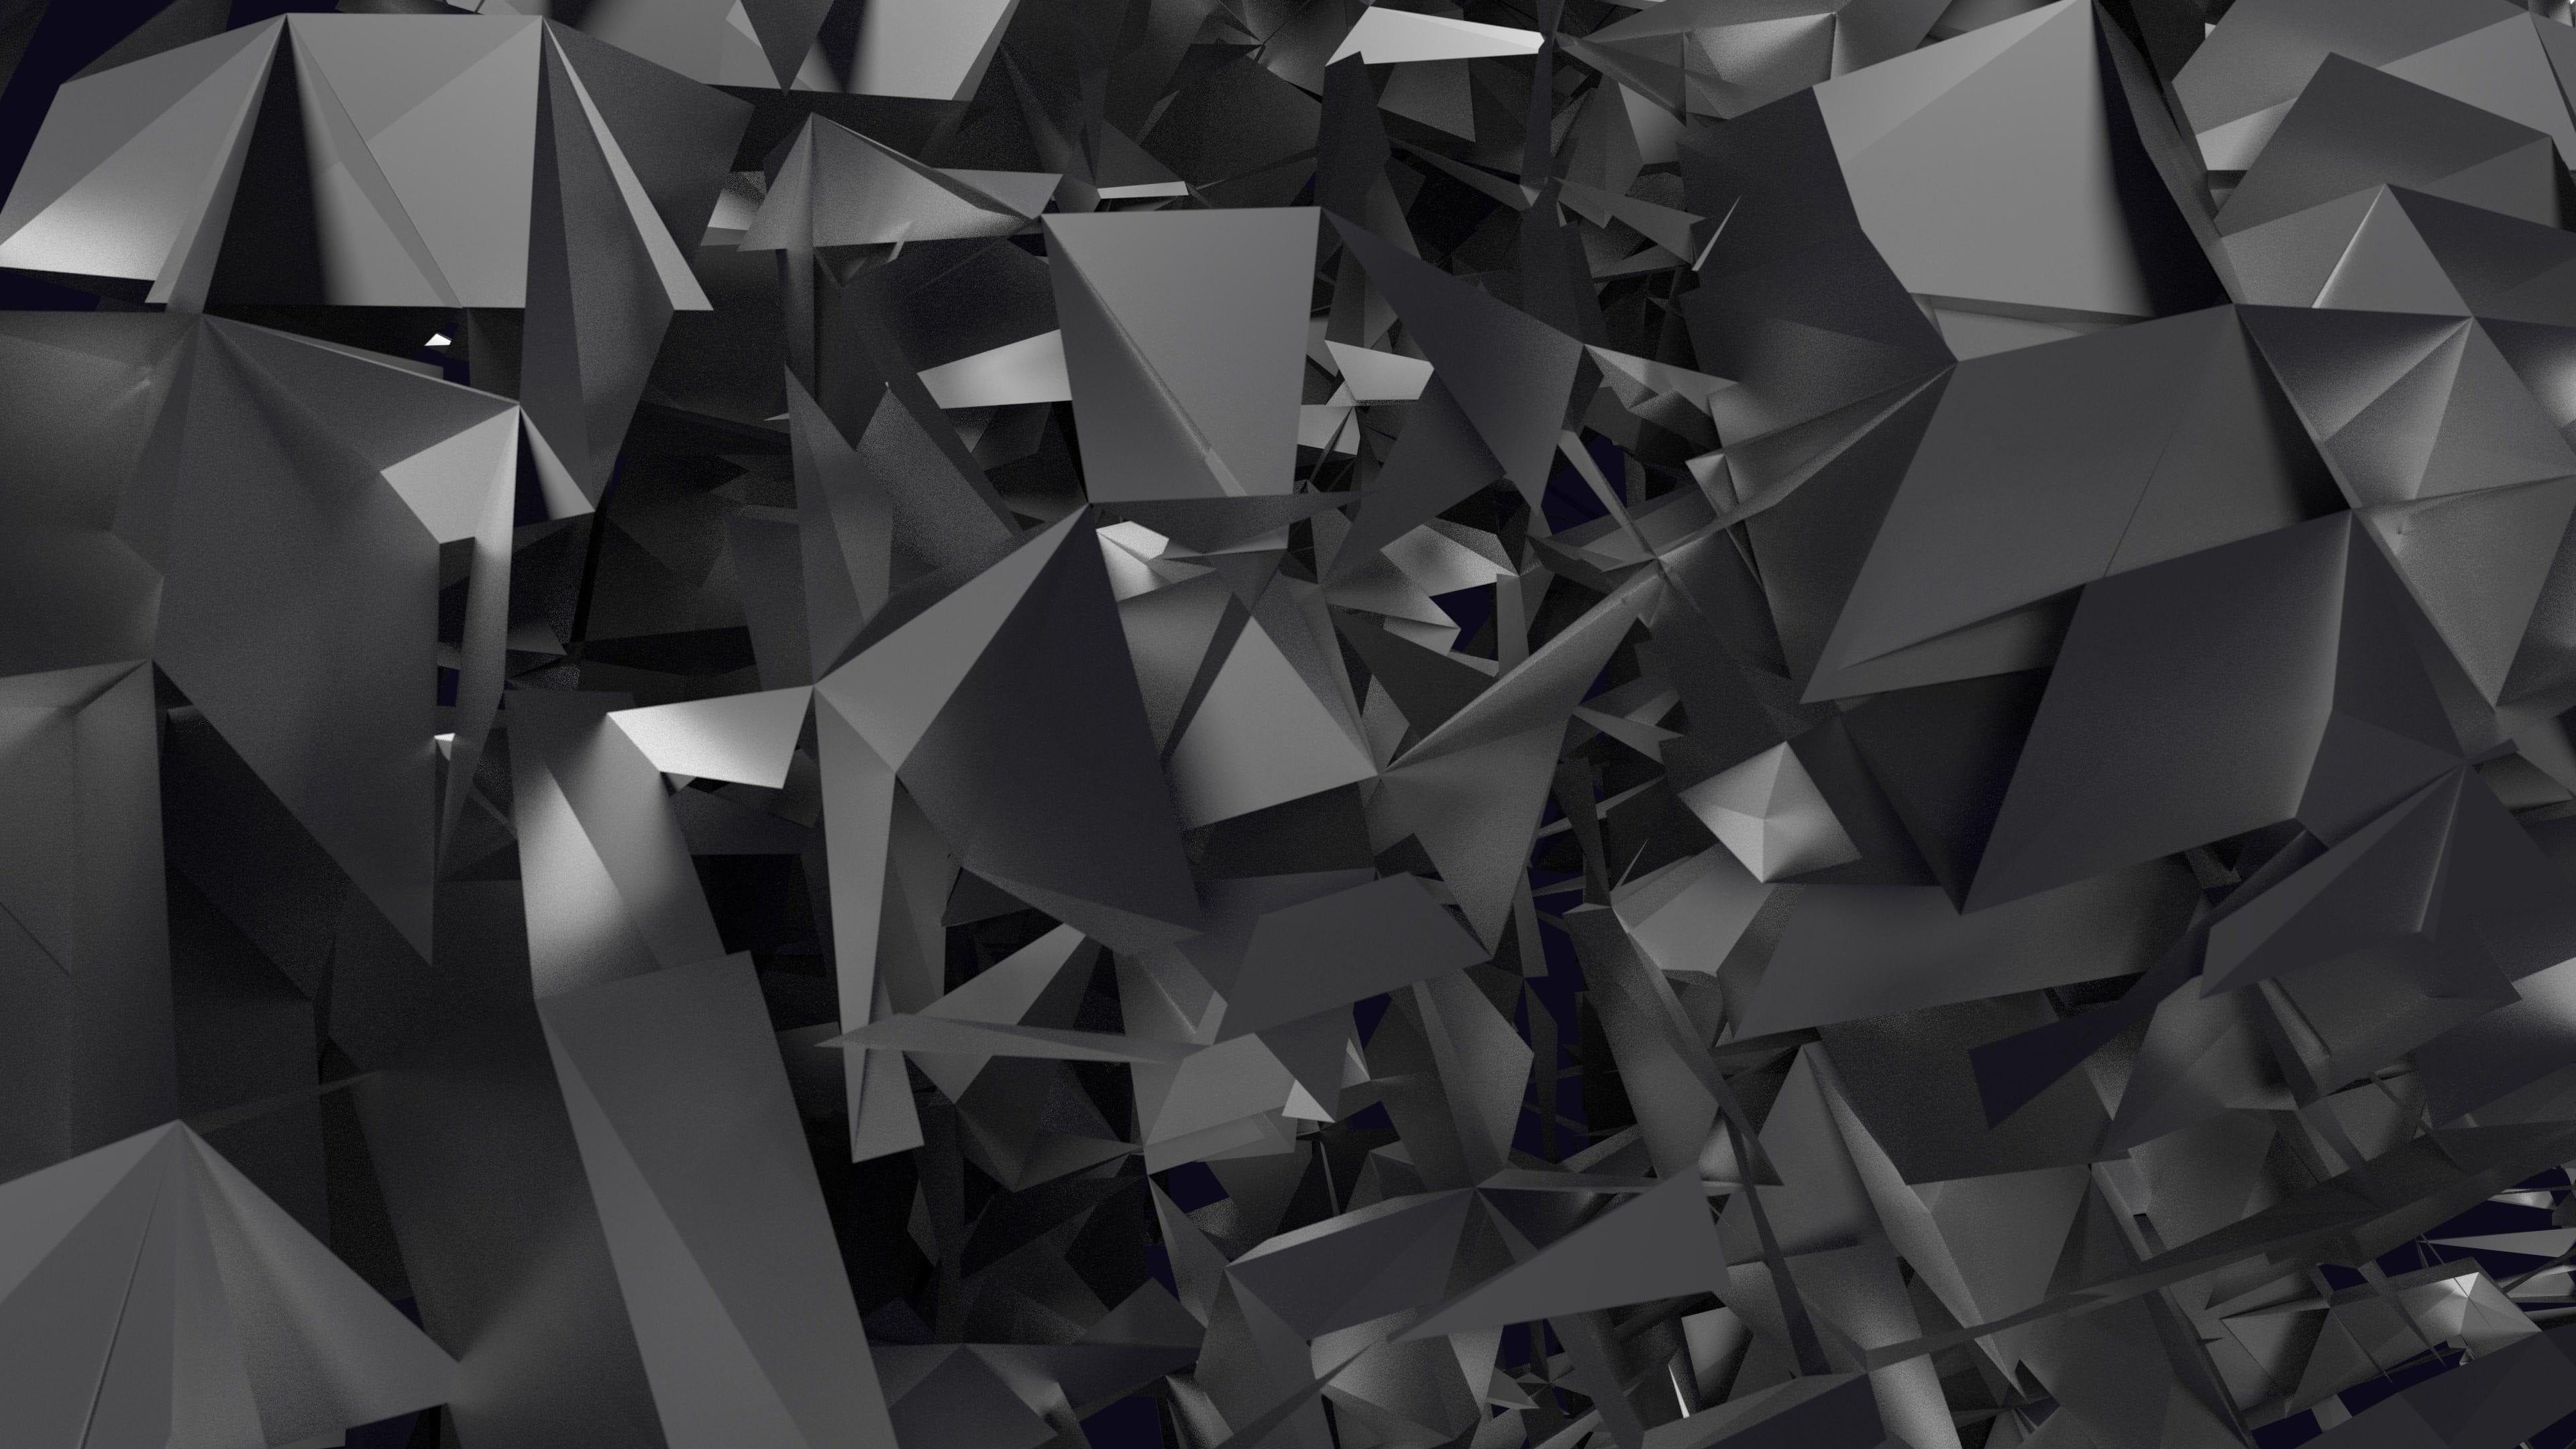 Grey And Black Prisim Illustration Grayscale Digital Wallpaper Abstract Geometry 4k Wallpaper H Abstract Wallpaper Geometric Shapes Art Digital Wallpaper Geometric desktop wallpaper 4k